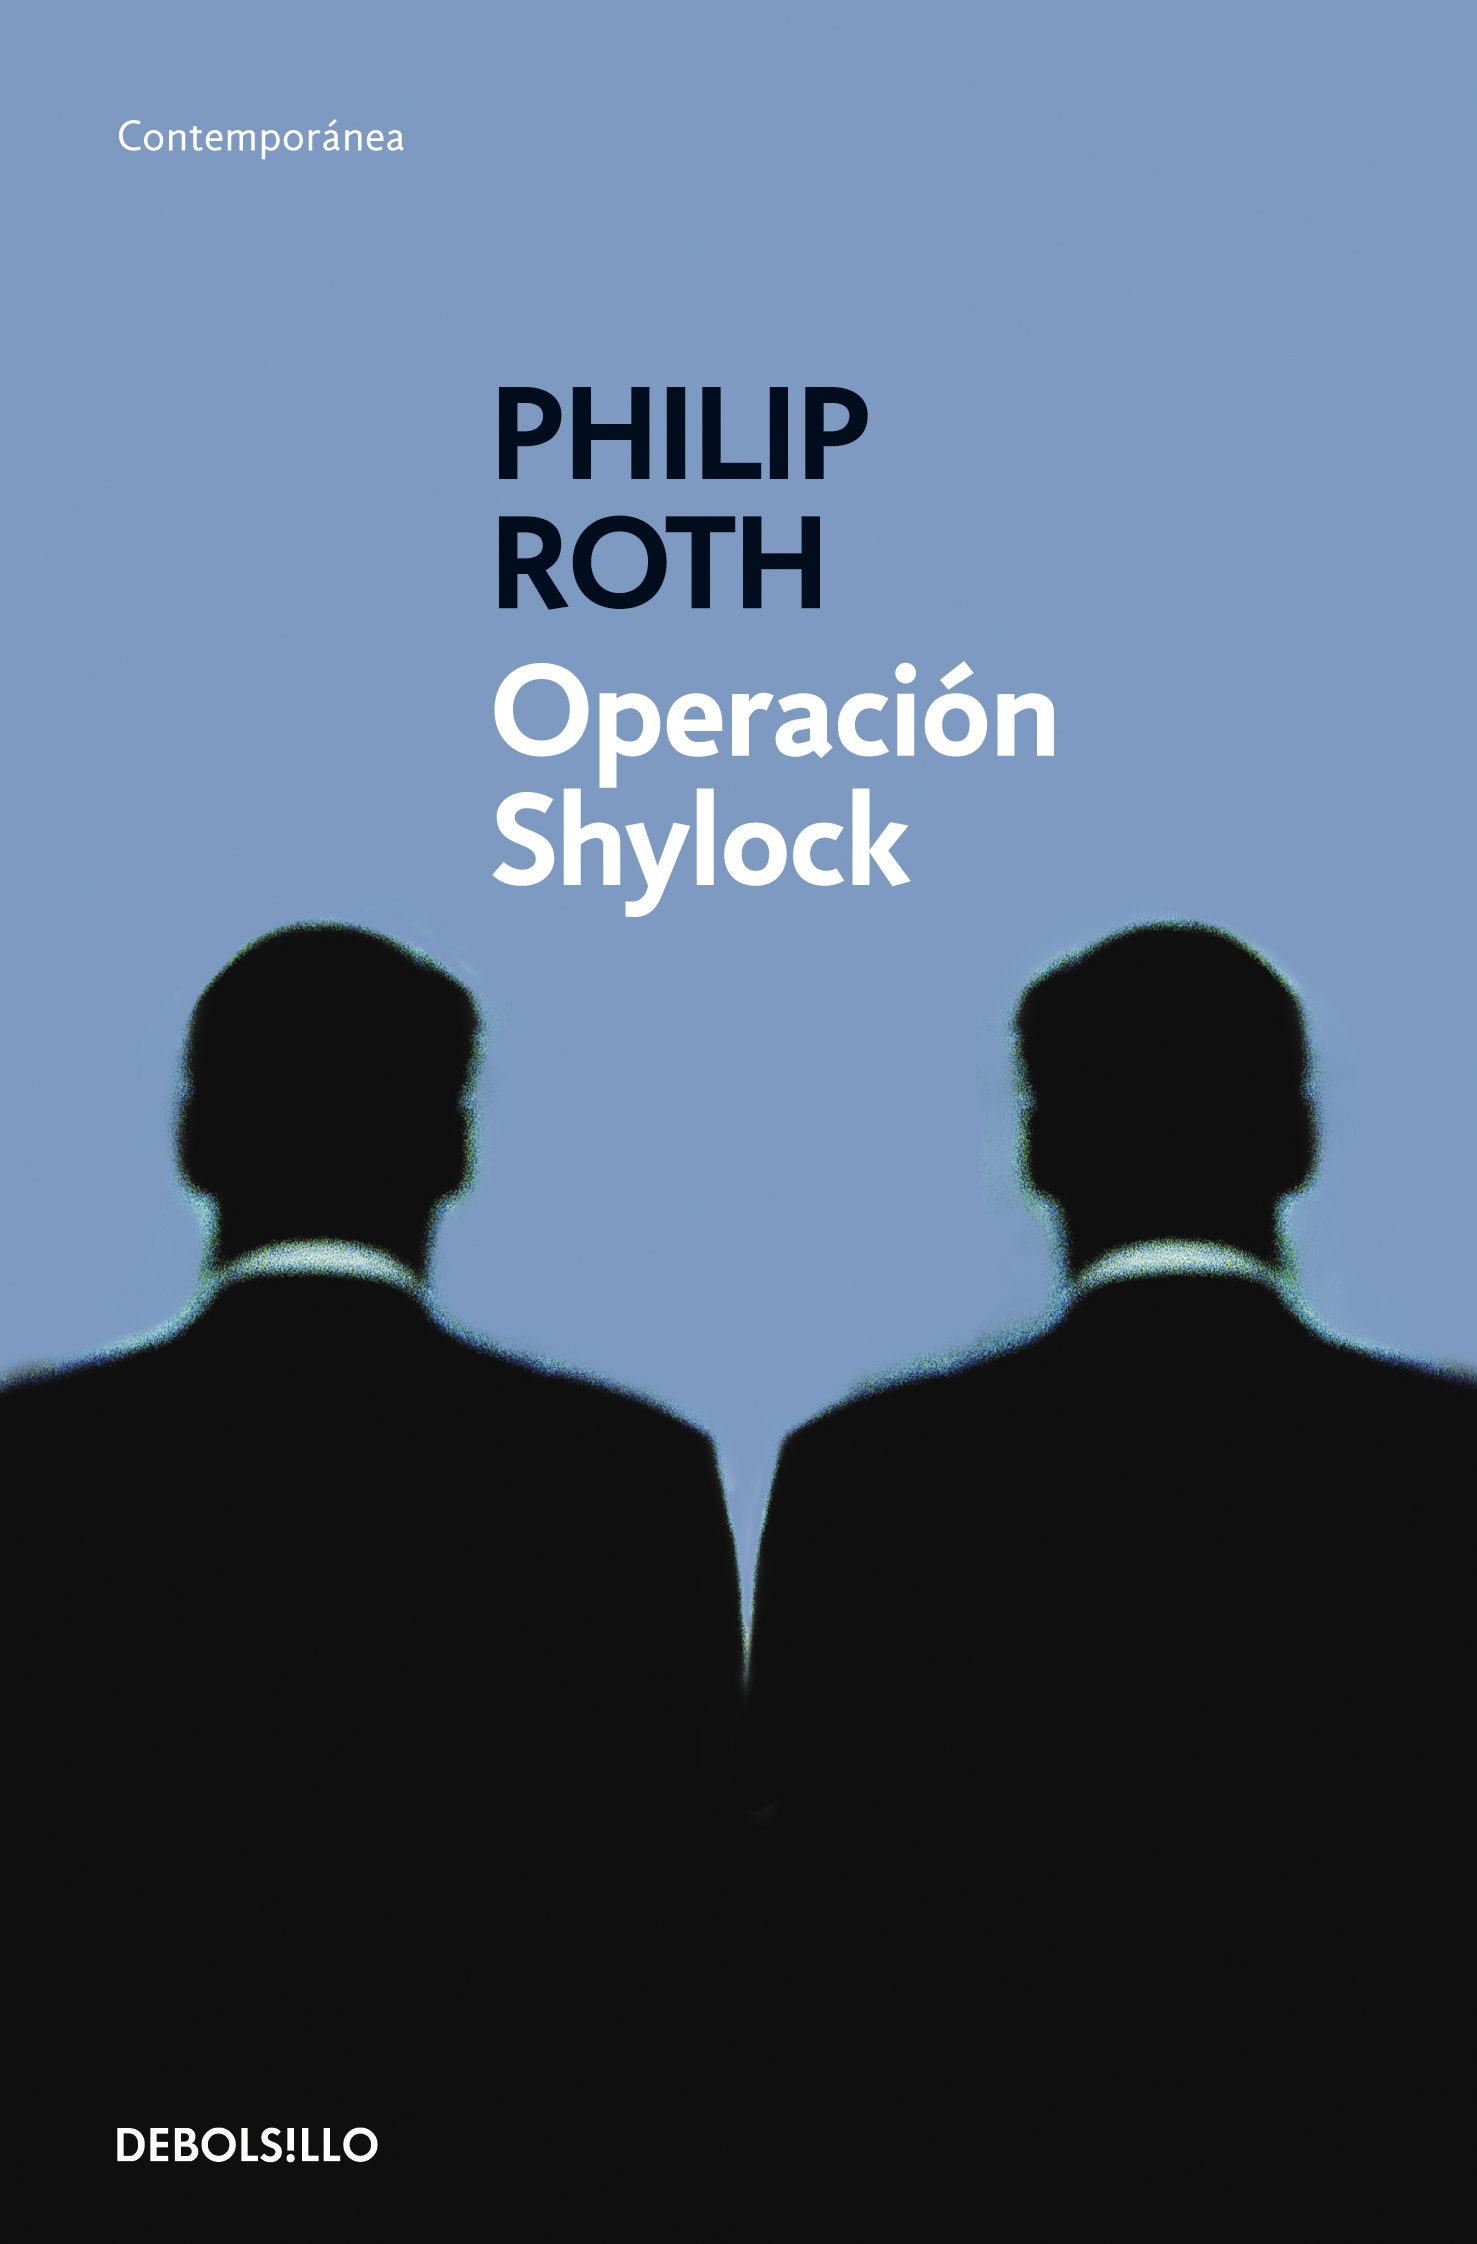 Operaci�n Shylock (ebook)philip Roth9788490325926